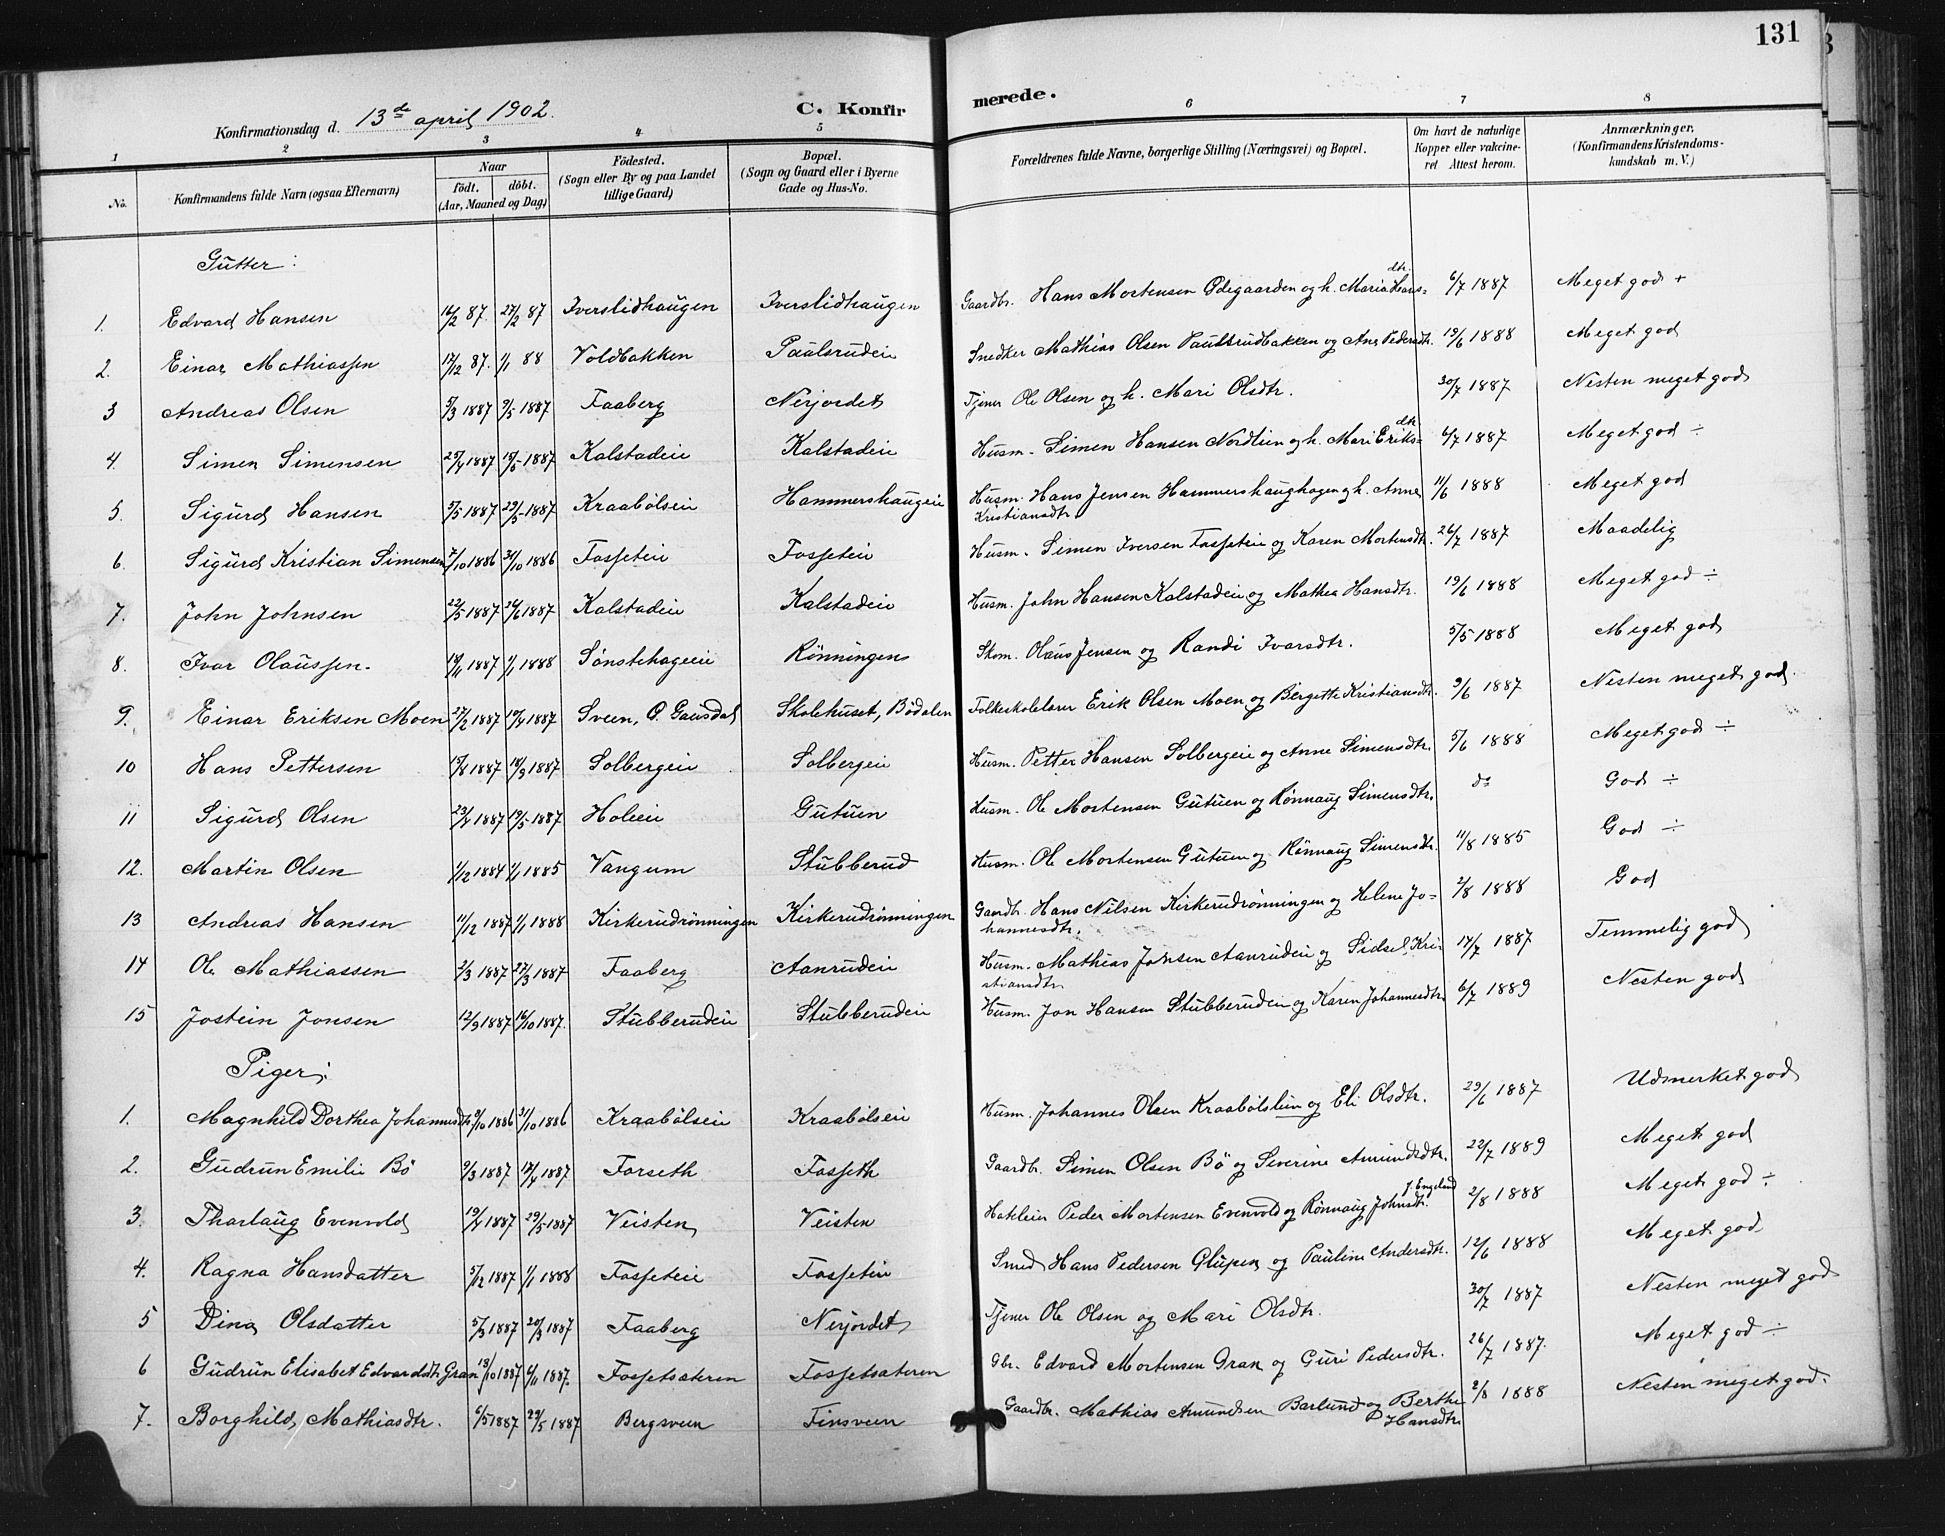 SAH, Vestre Gausdal prestekontor, Klokkerbok nr. 3, 1896-1925, s. 131